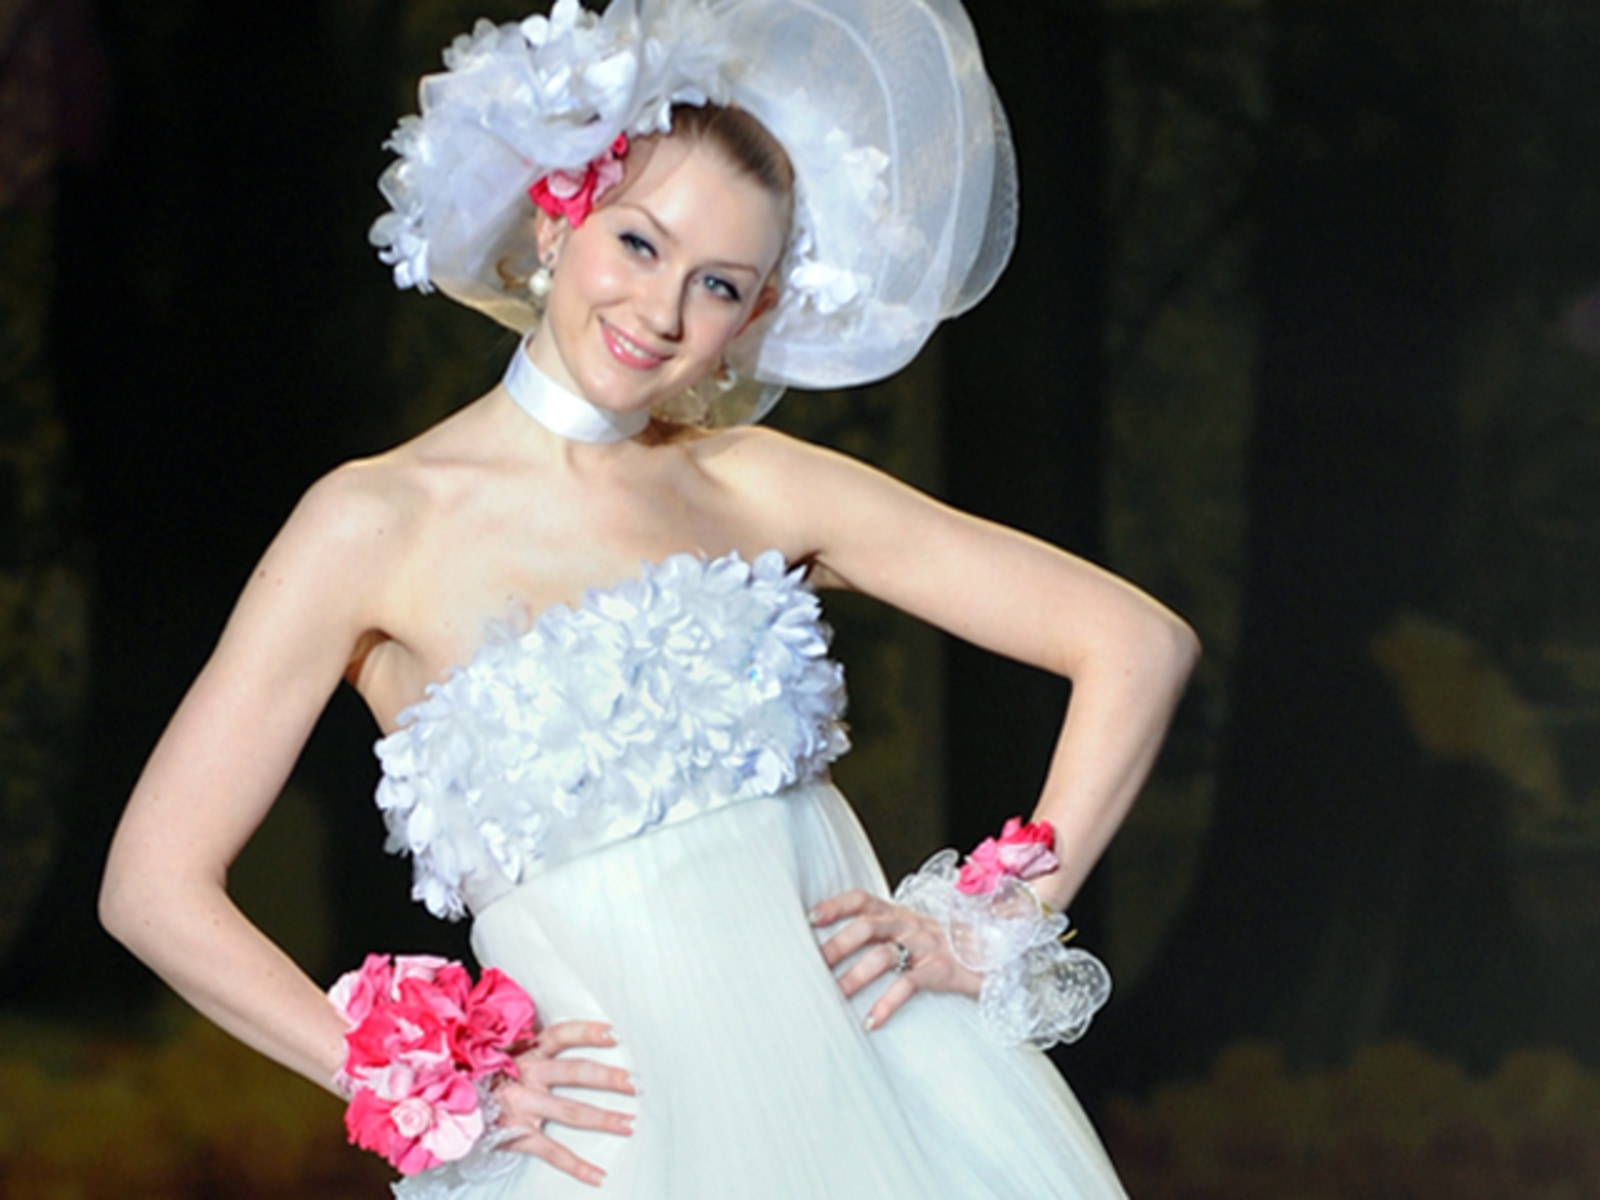 A model shows off a wedding dress by Jap